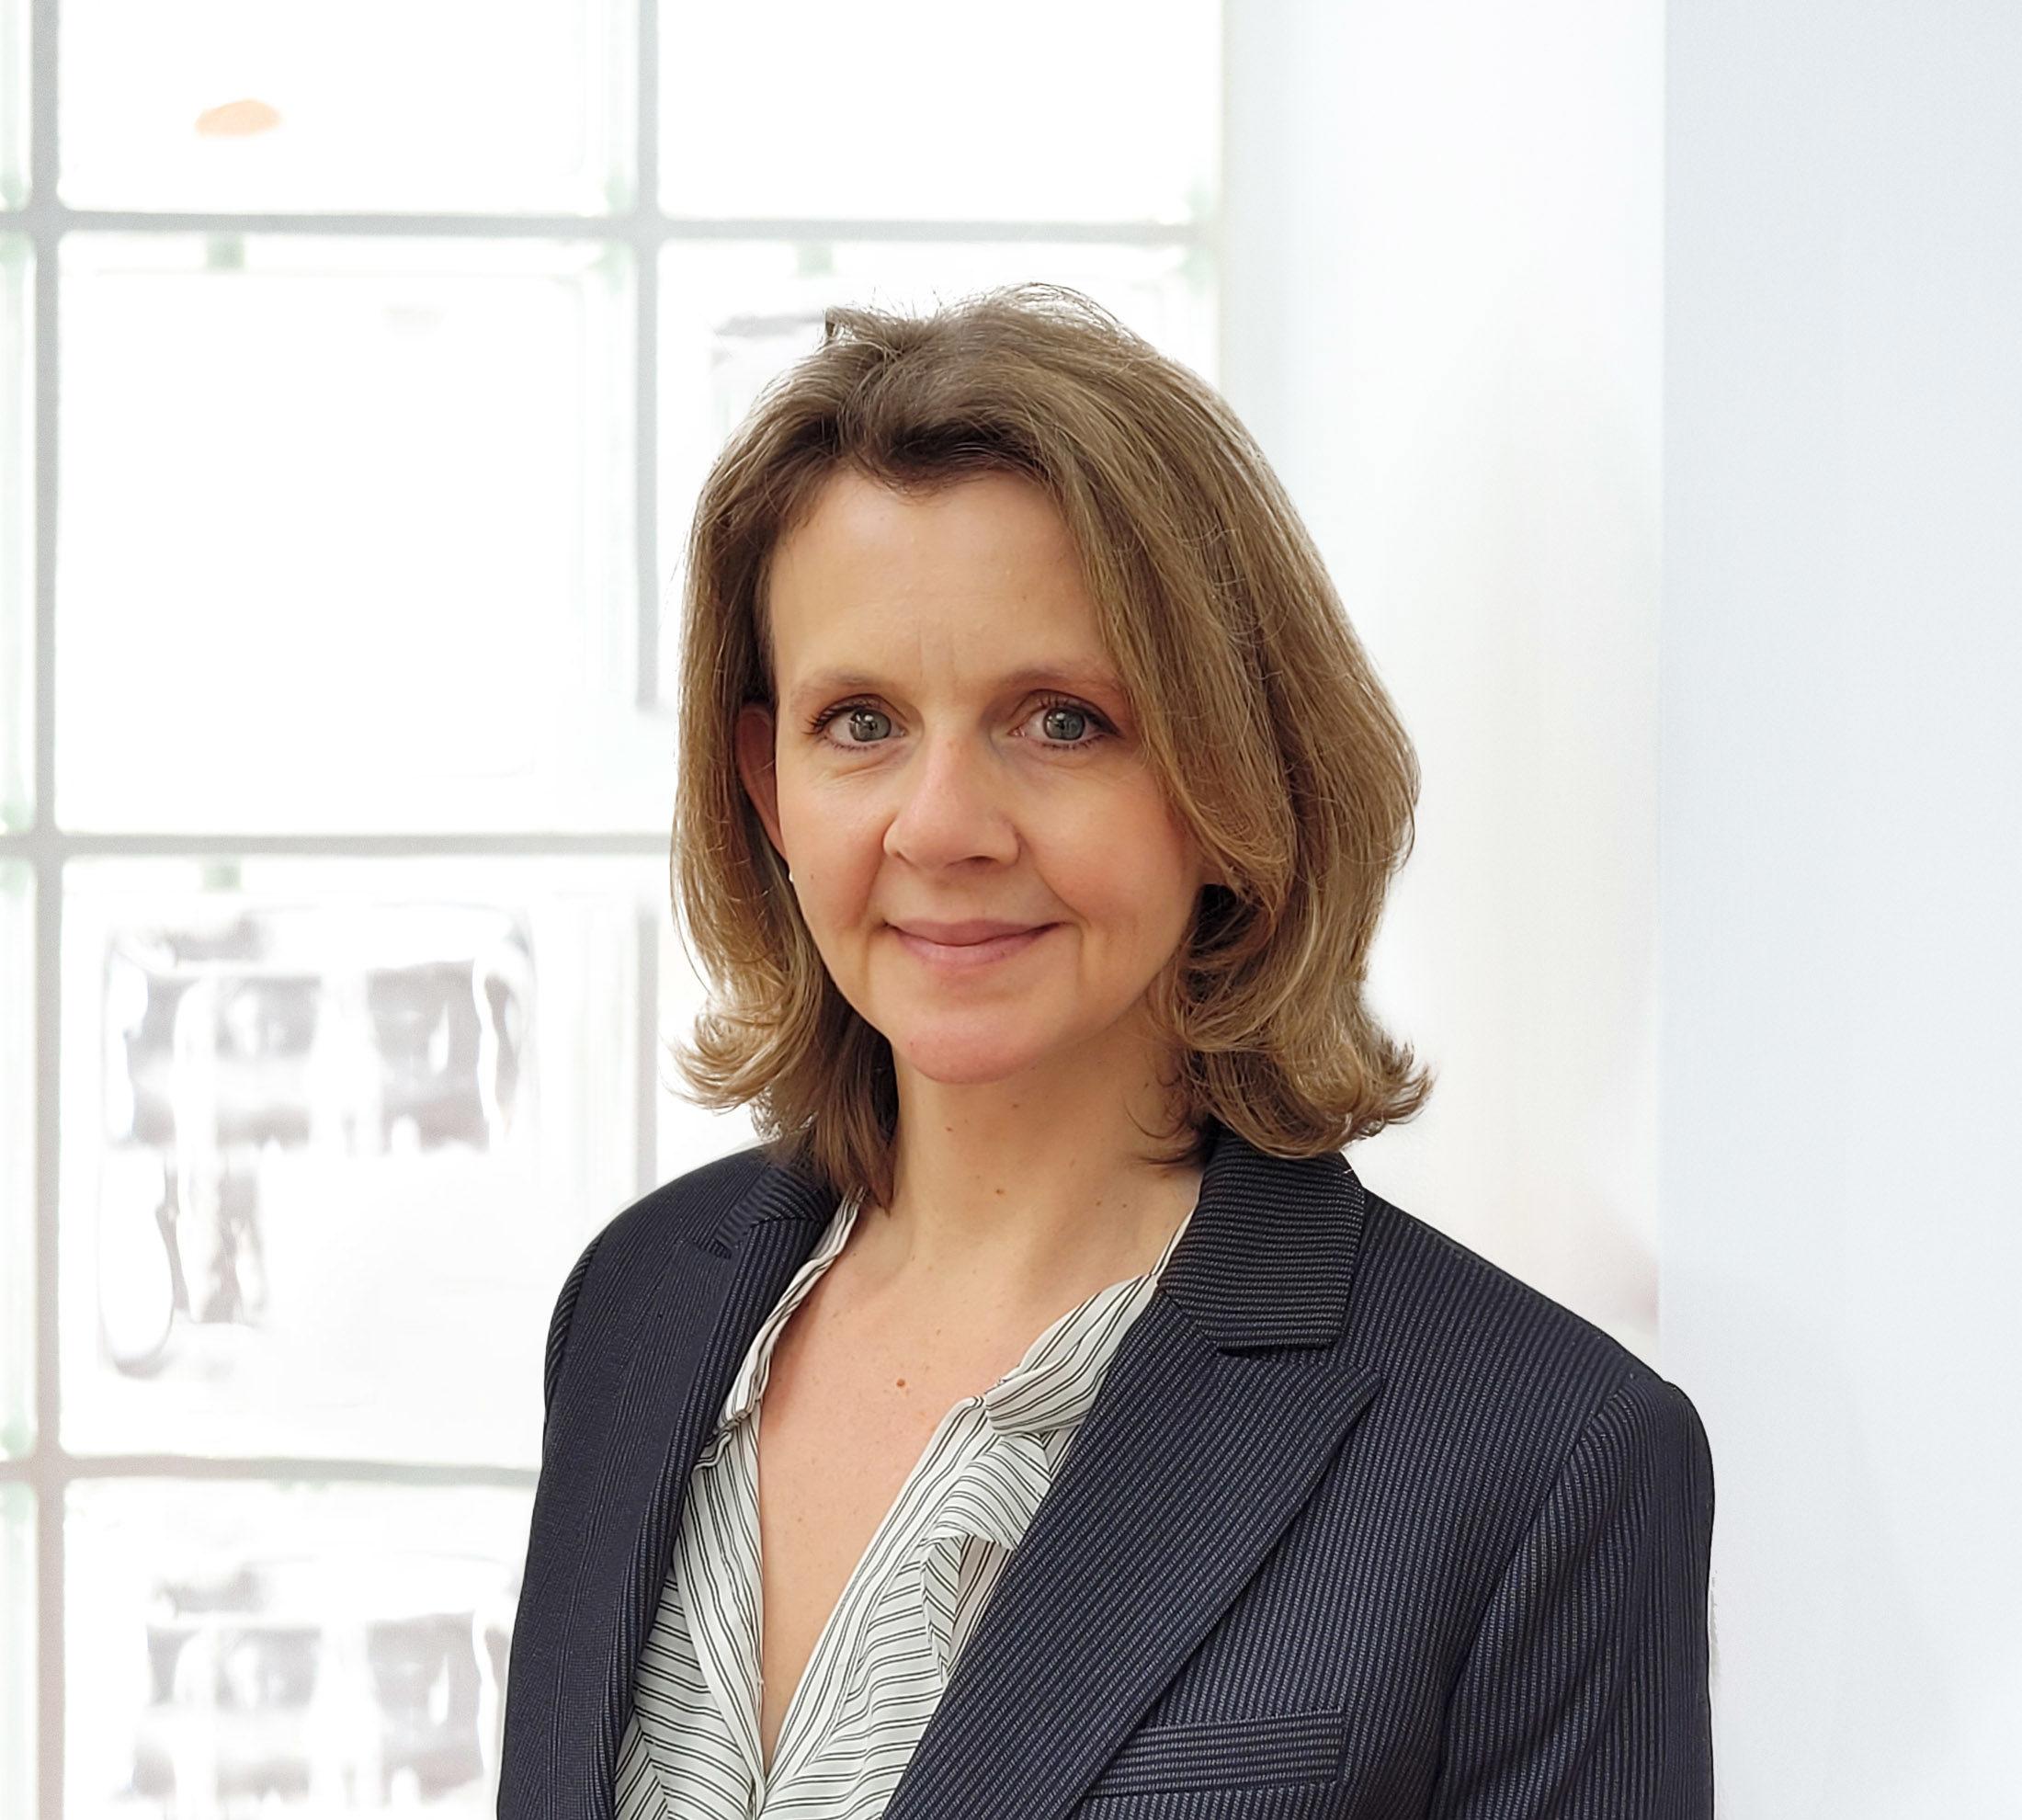 Cristina Benezet, Associate at Acuity Law